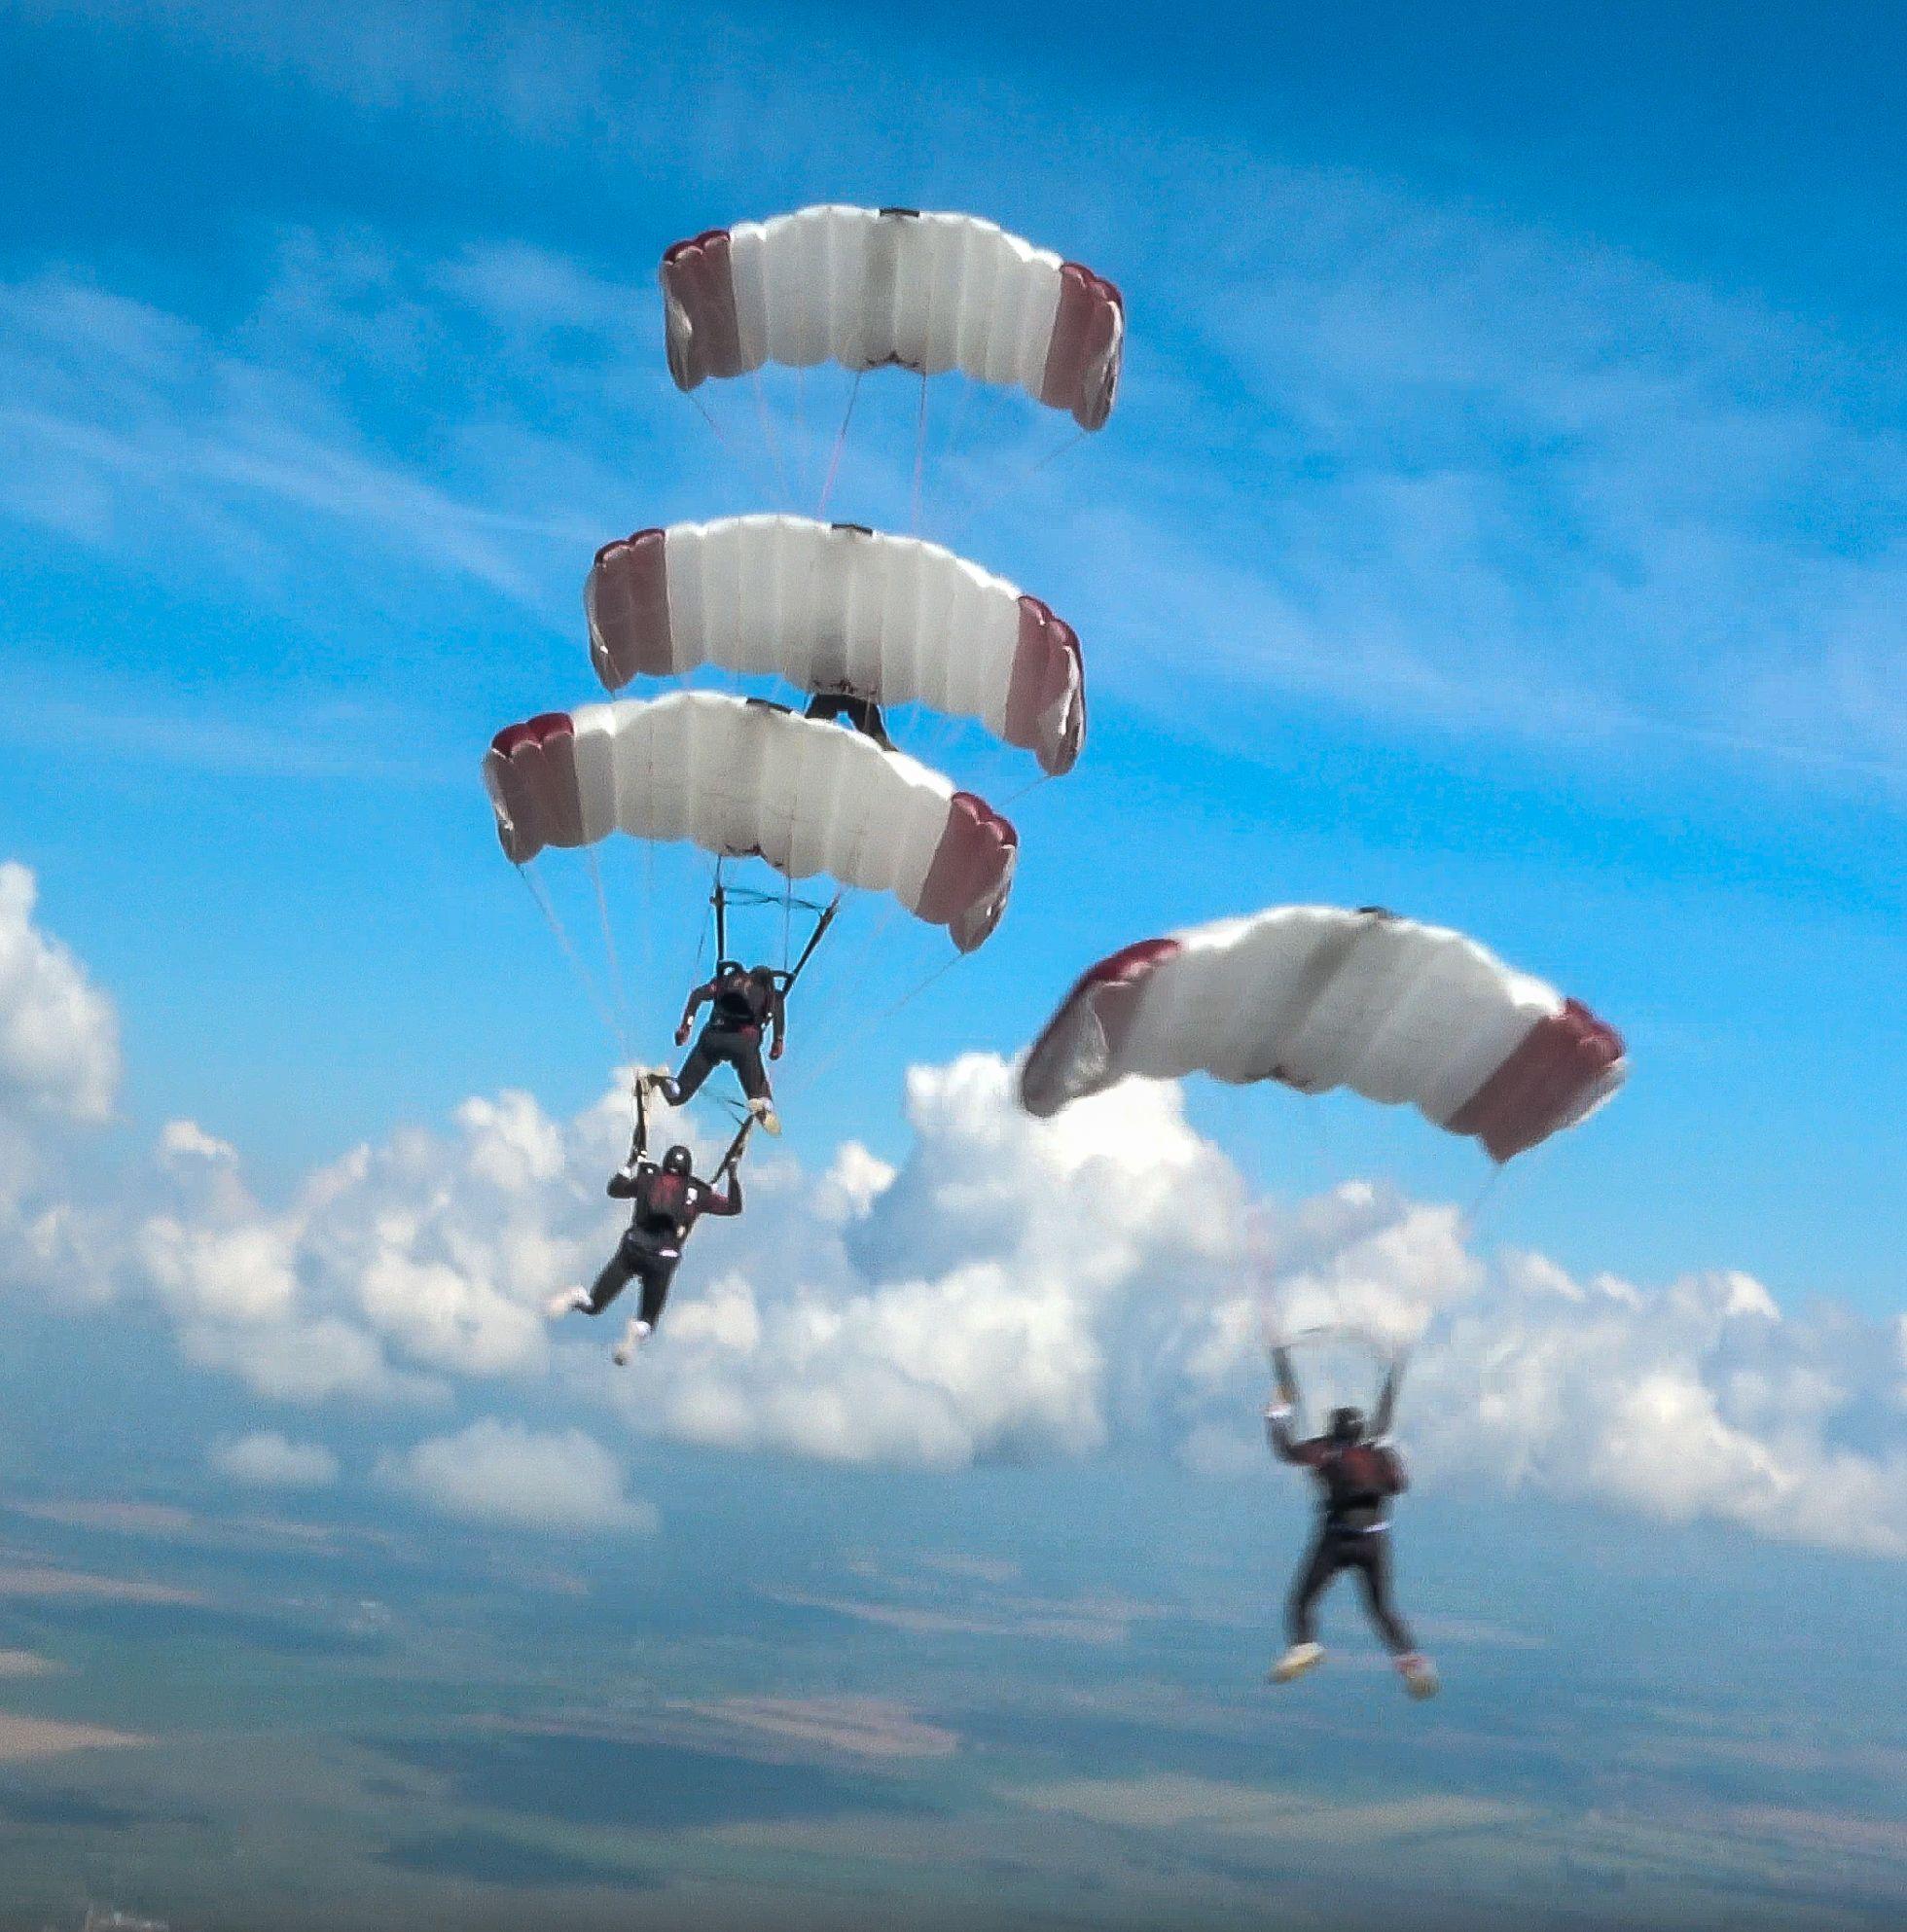 Qatar Takes Gold in World Parachuting Championships Quadruple Event